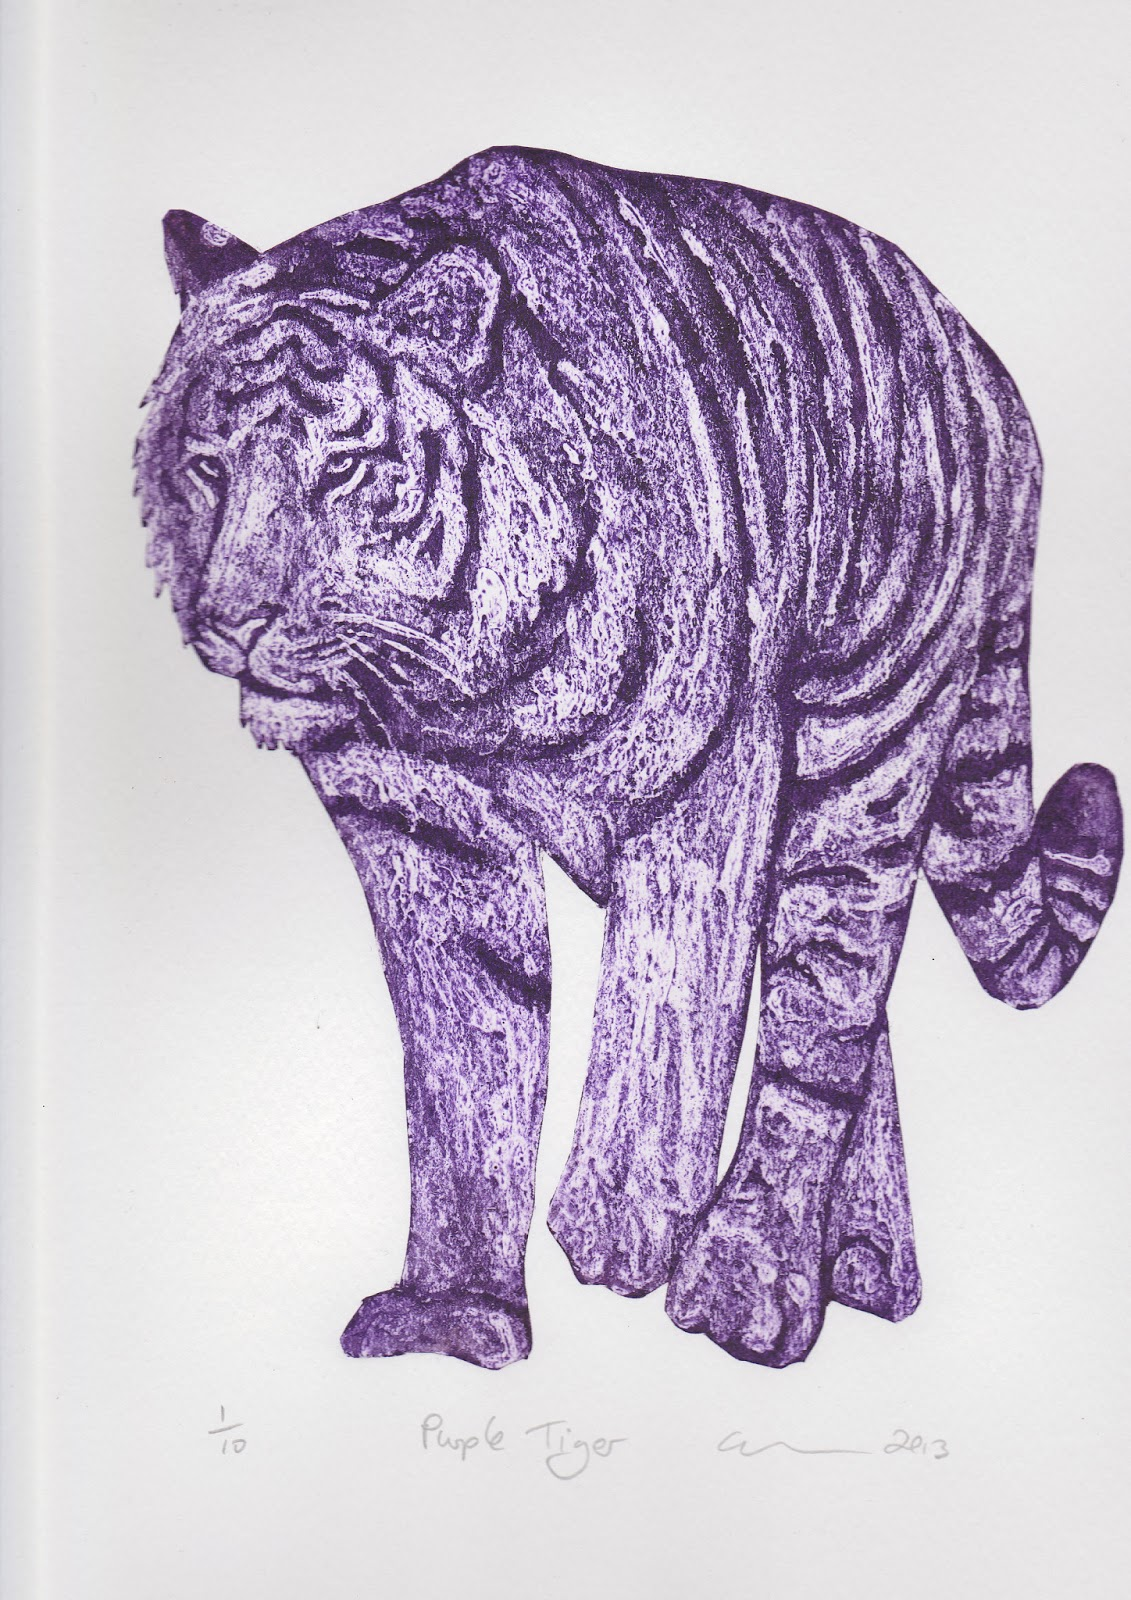 Purple Tiger Stargazer Nail Art Designs By Top Nails: Clare Sherwen Printmaker/Painter: Purple Animals